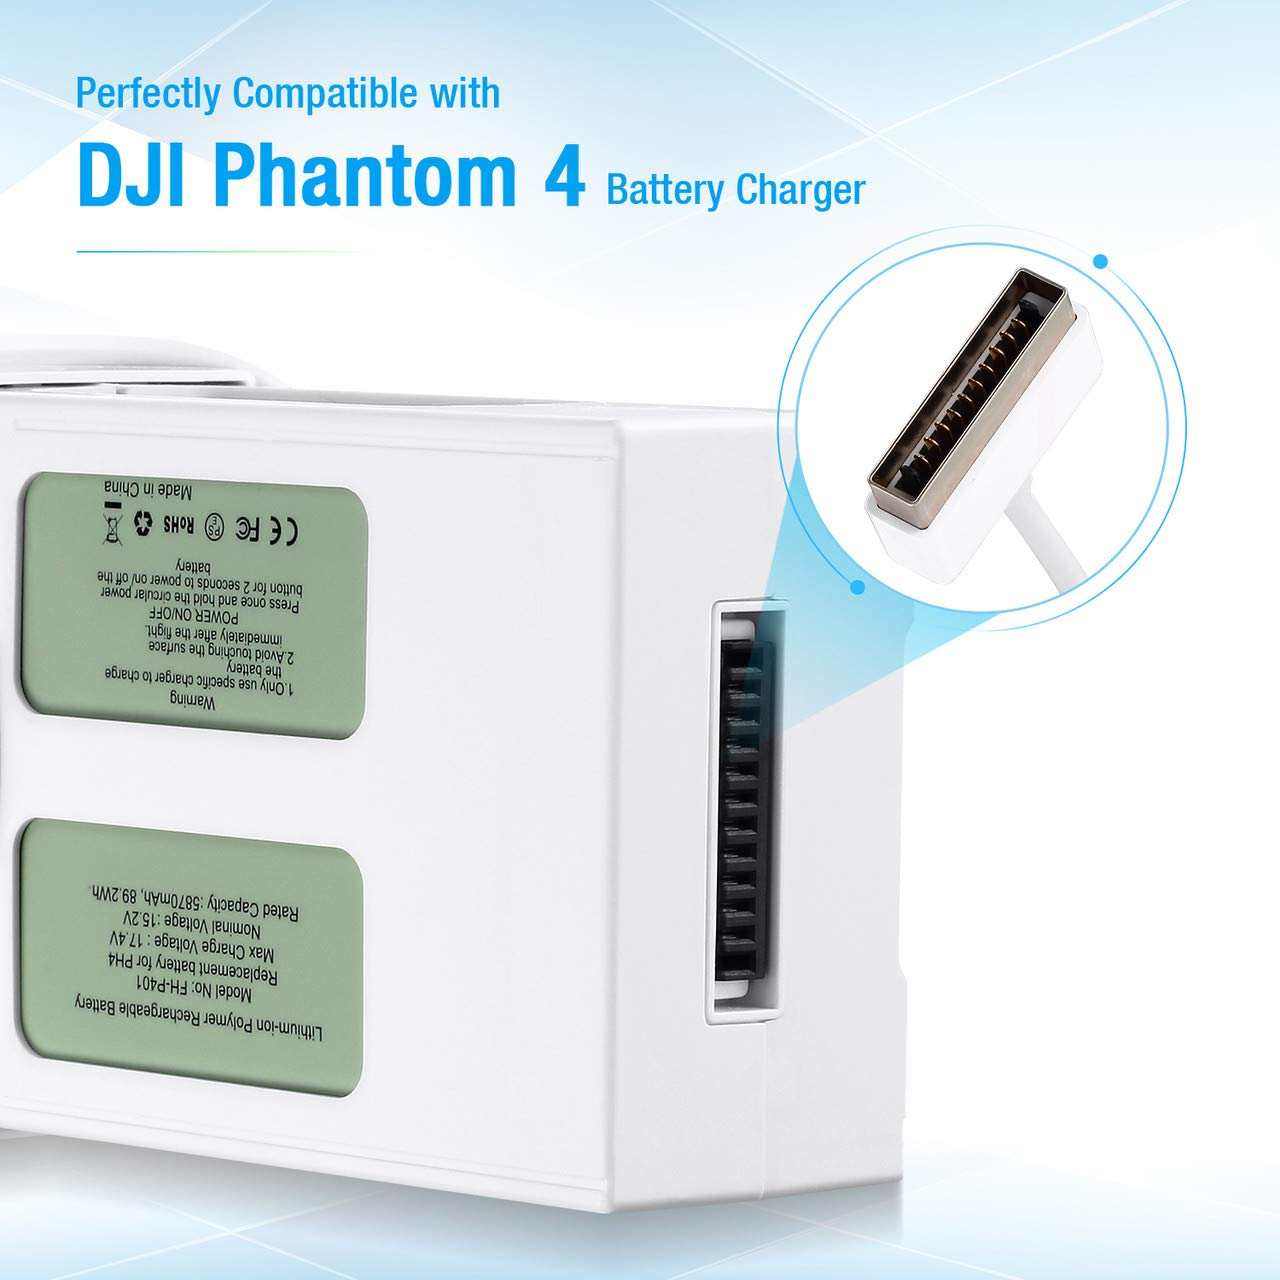 Powerextra High Capacity Phantom 4 Series (15.2V 5870 mAh) LiPo Flight Battery + Battery Safe Bag Replacement for DJI Phantom 4, Phantom 4 Pro, Phantom 4 Pro V2.0, Phantom 4 Advanced Drone - Upgrade by Powerextra (Image #3)